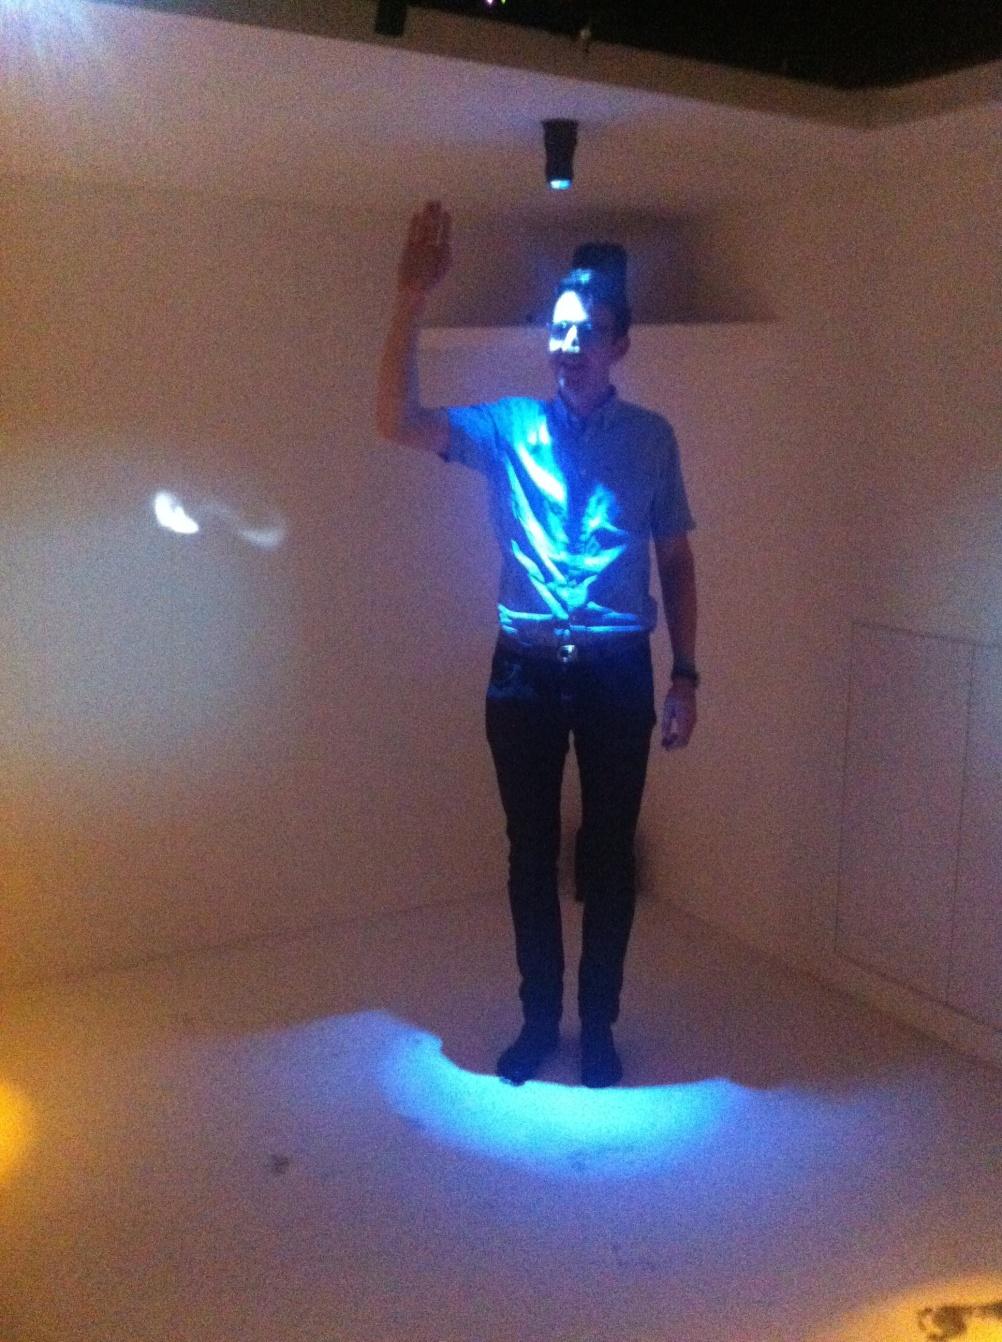 Kagura installation by consultancy Integral Vision